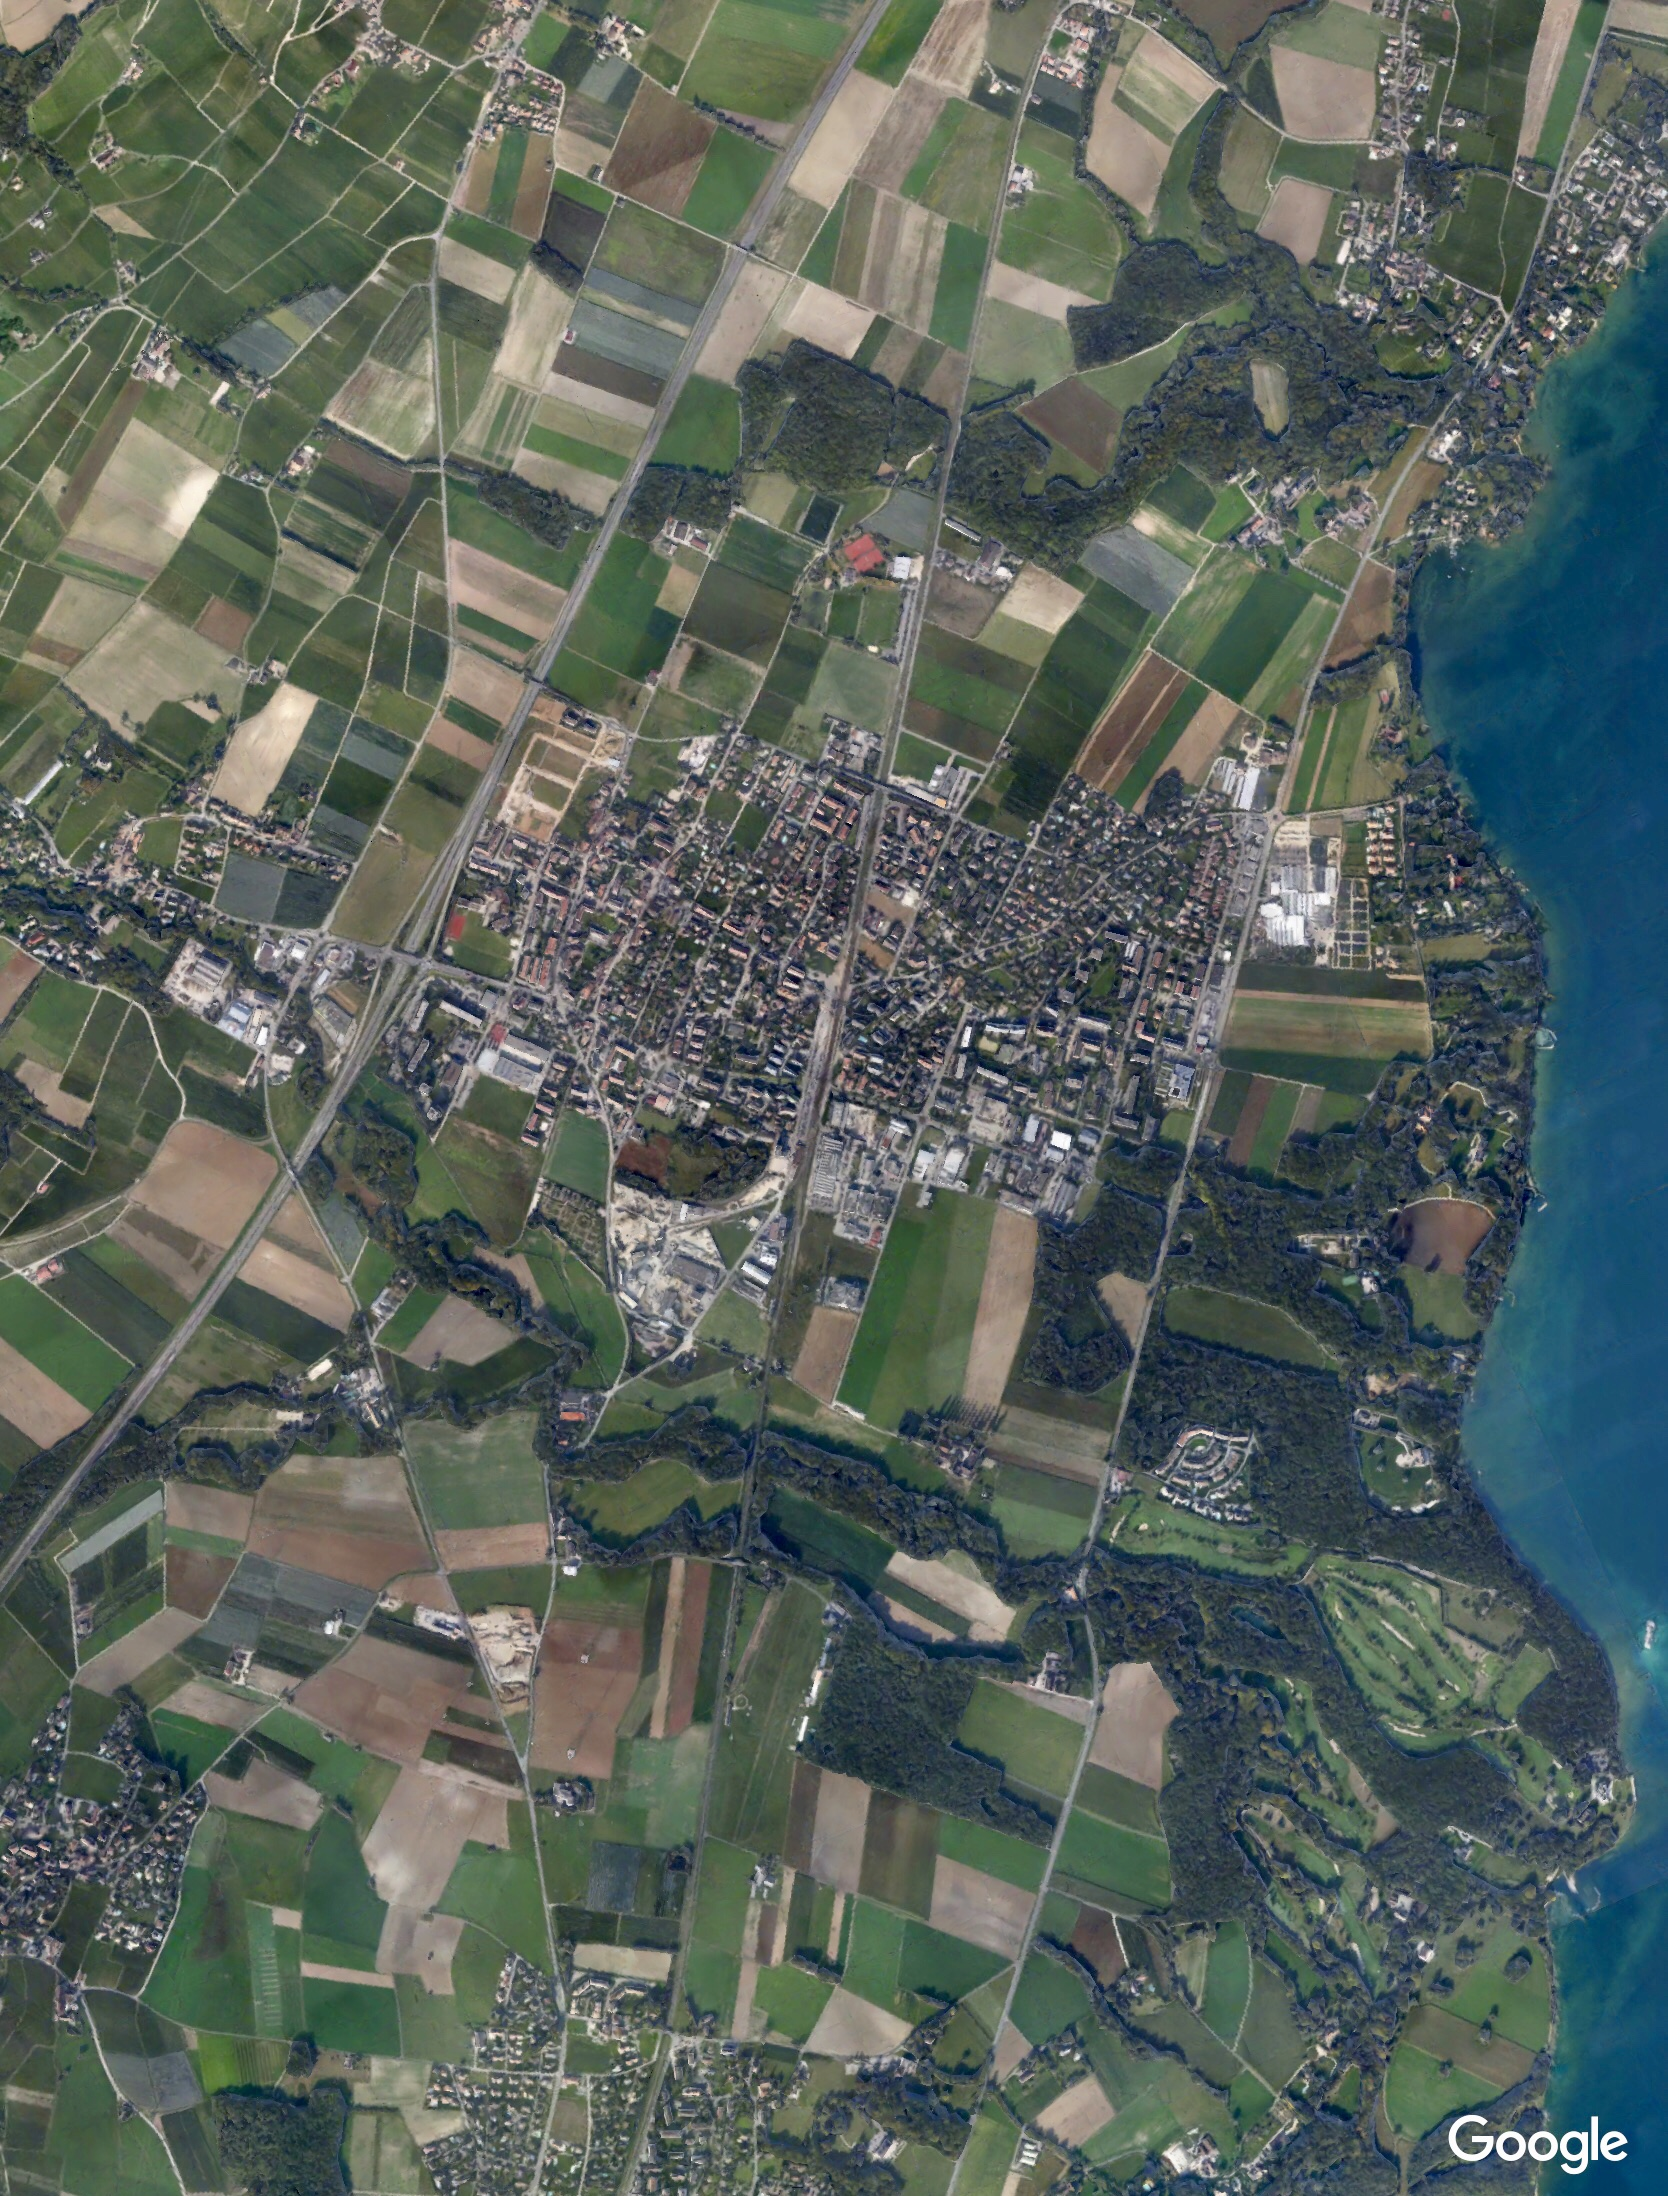 [Jeu] Google Maps Game (GMG) - Page 18 37_C89_BB7_0_C74_45_B1_99_A1_C6_F6_C619_BFFB